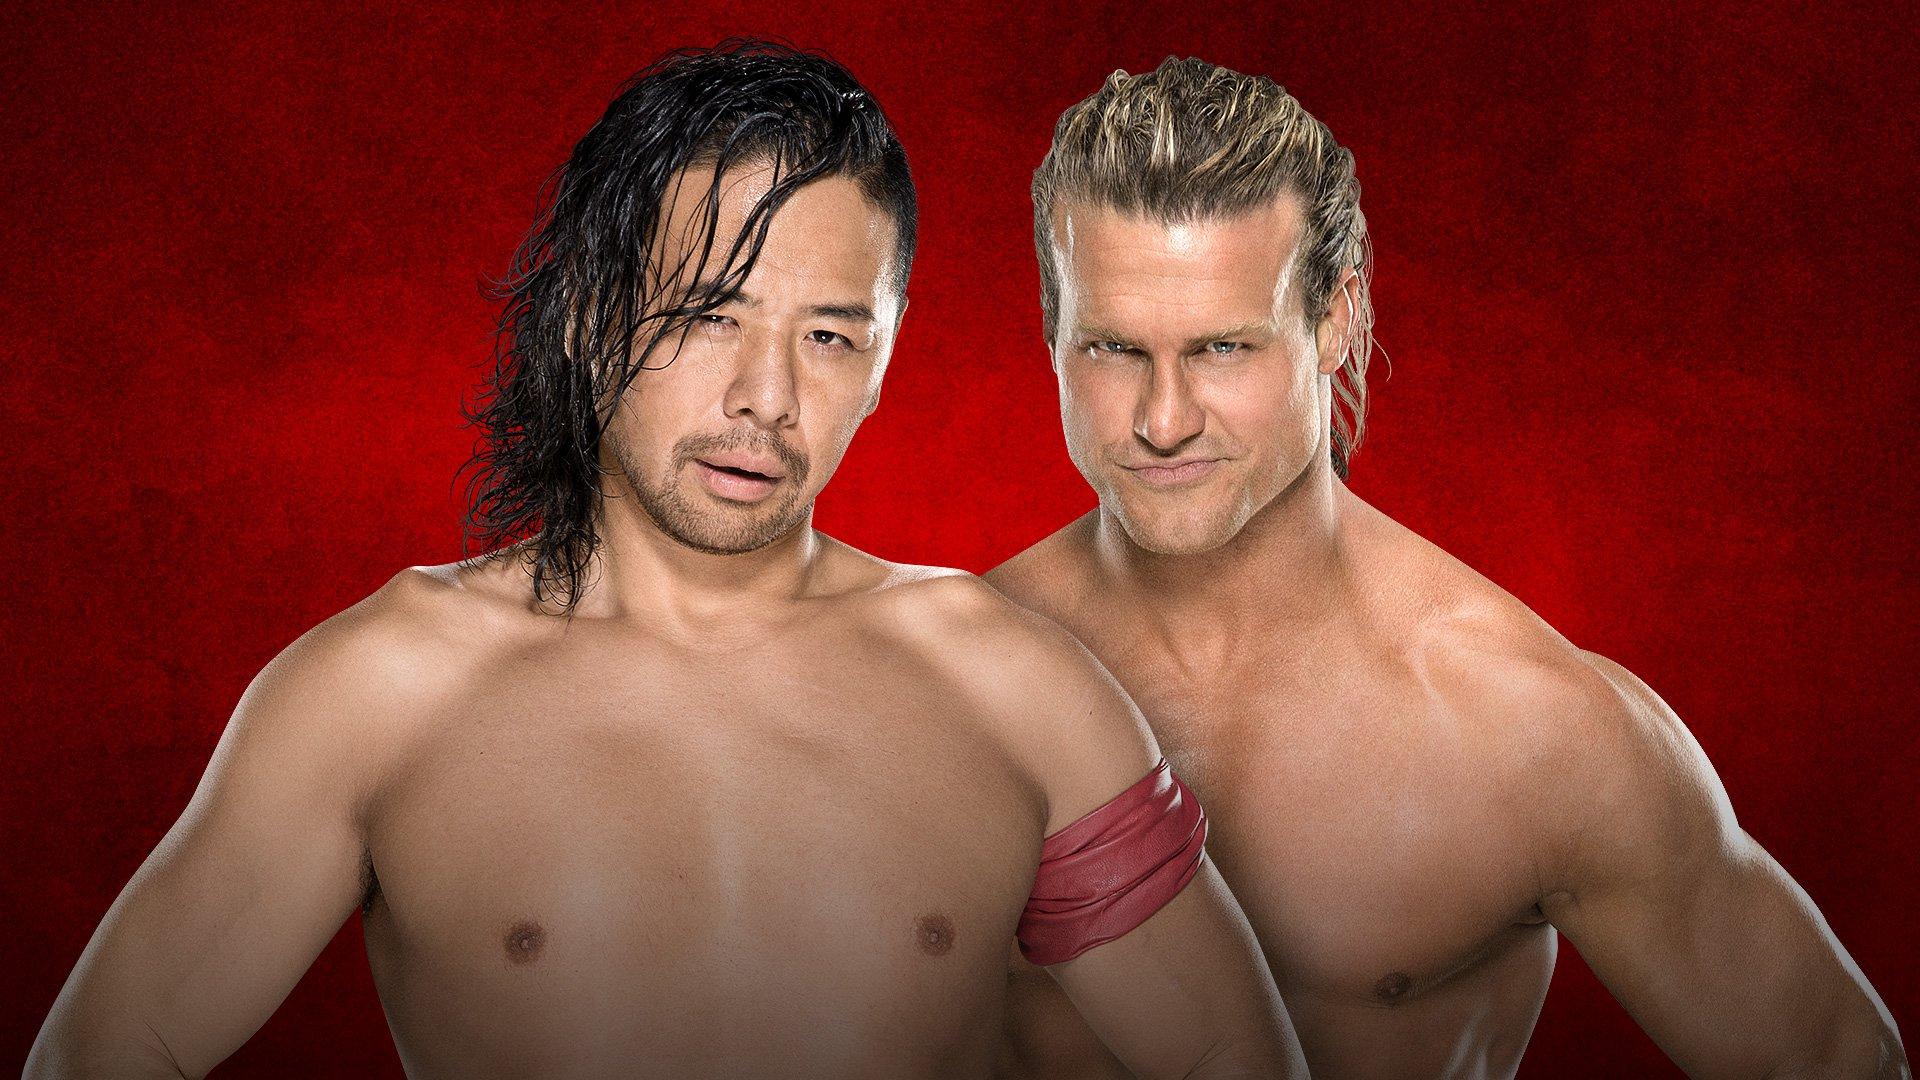 WWE Backlash: Shinsuke Nakamura vs. Dolph Ziggler